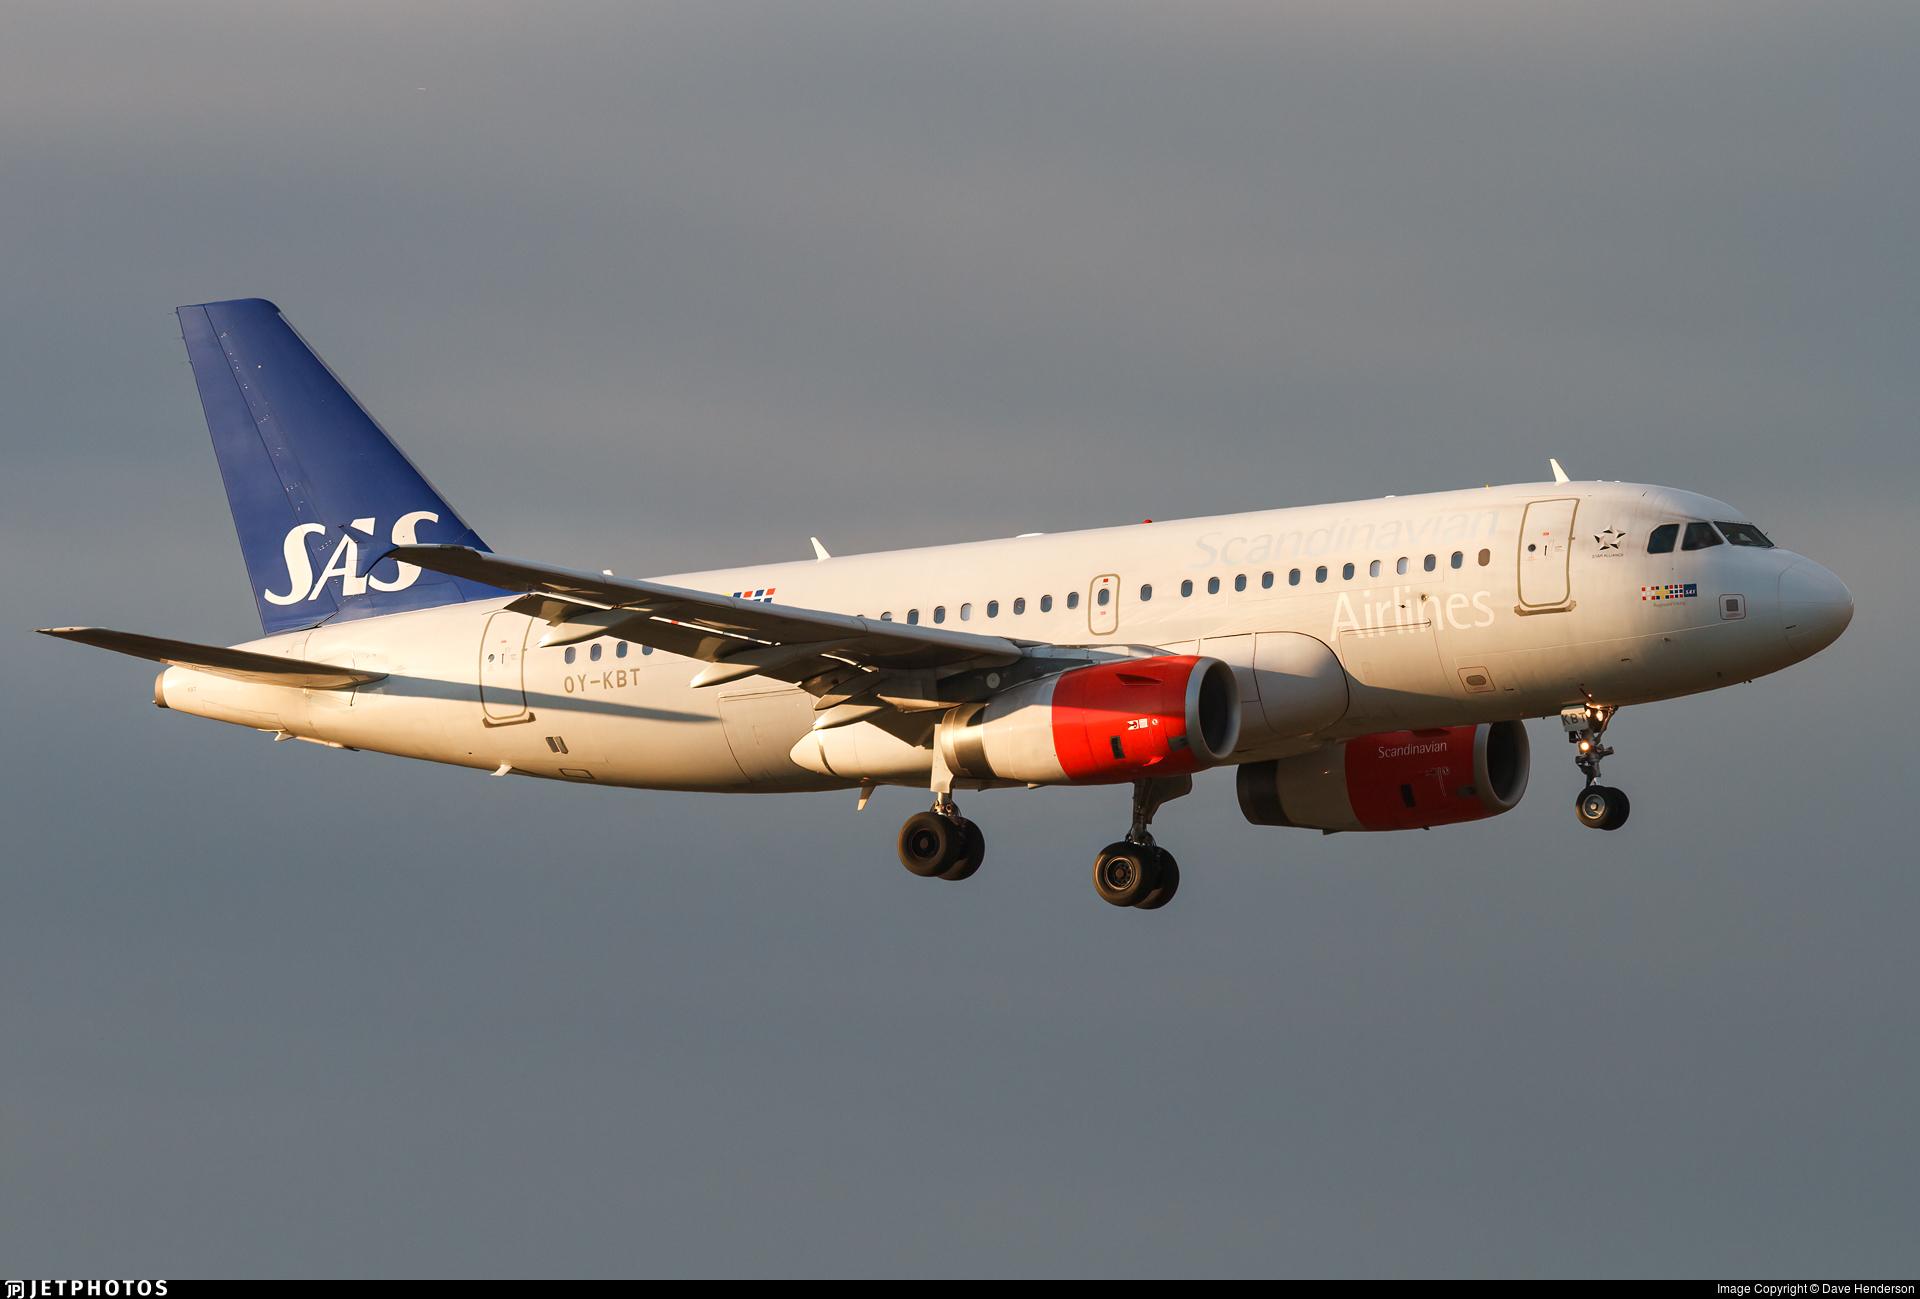 OY-KBT - Airbus A319-132 - Scandinavian Airlines (SAS)